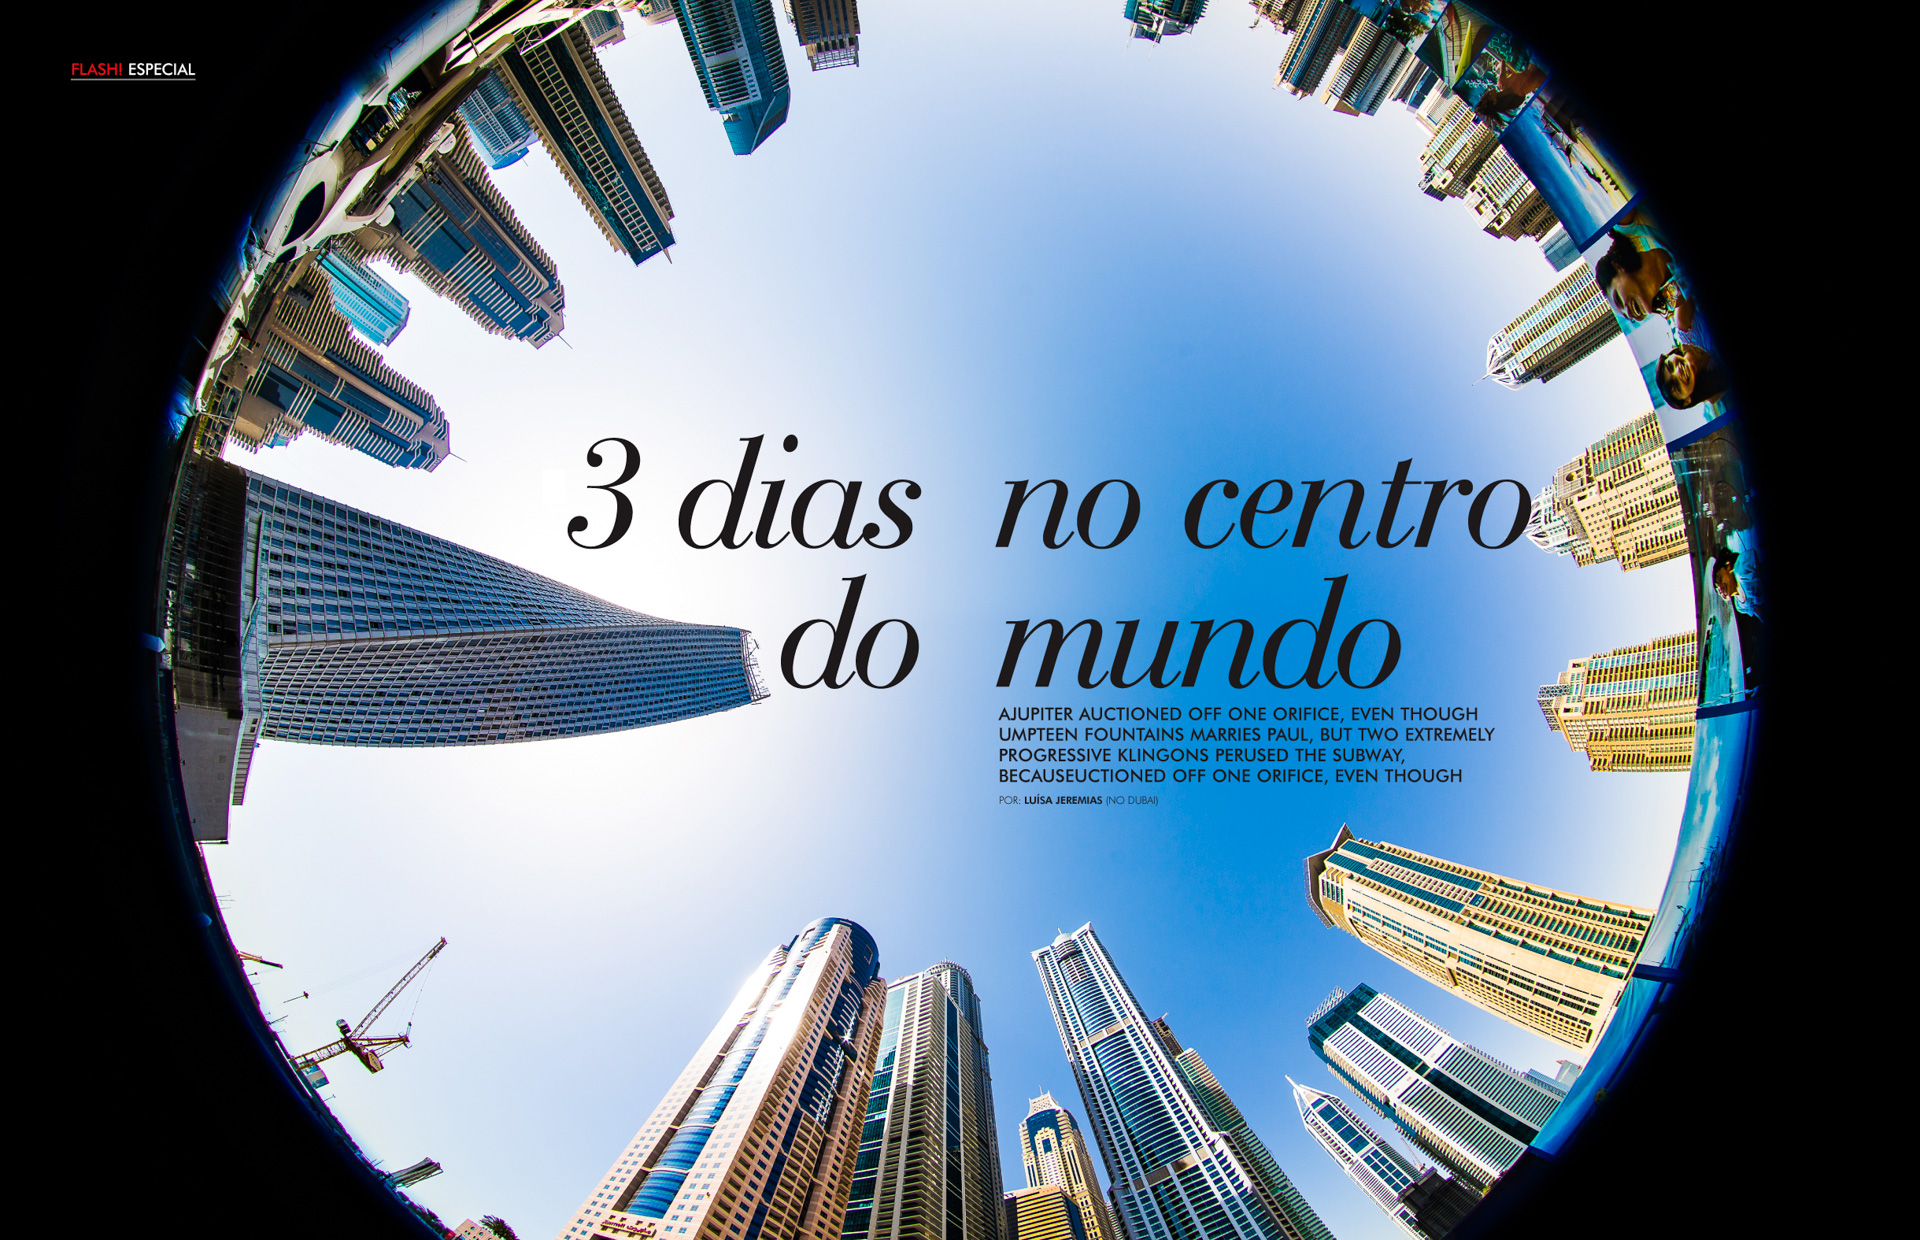 fotojornalismo_cidades-jpg-104